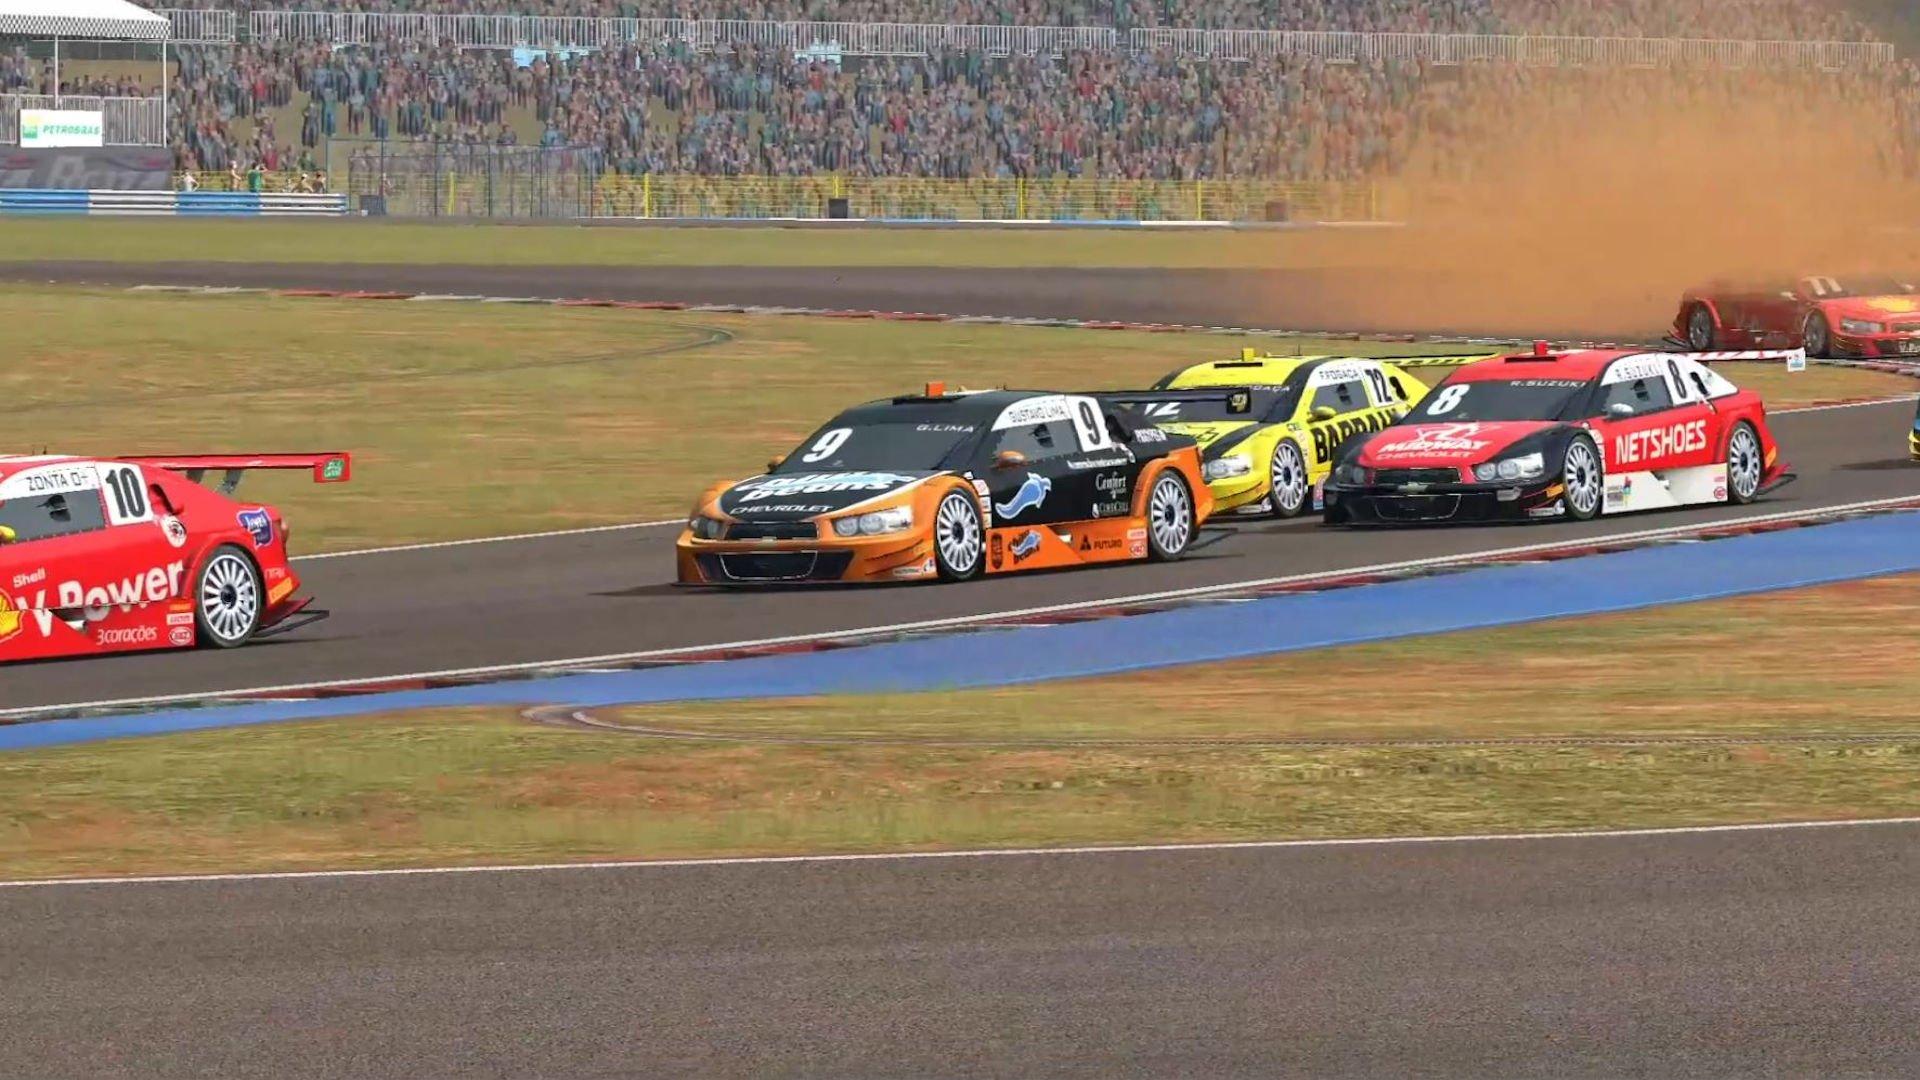 Automobilista-Test-Drive-Stock-Car-V8-Championship-Round-1-at-Goiania